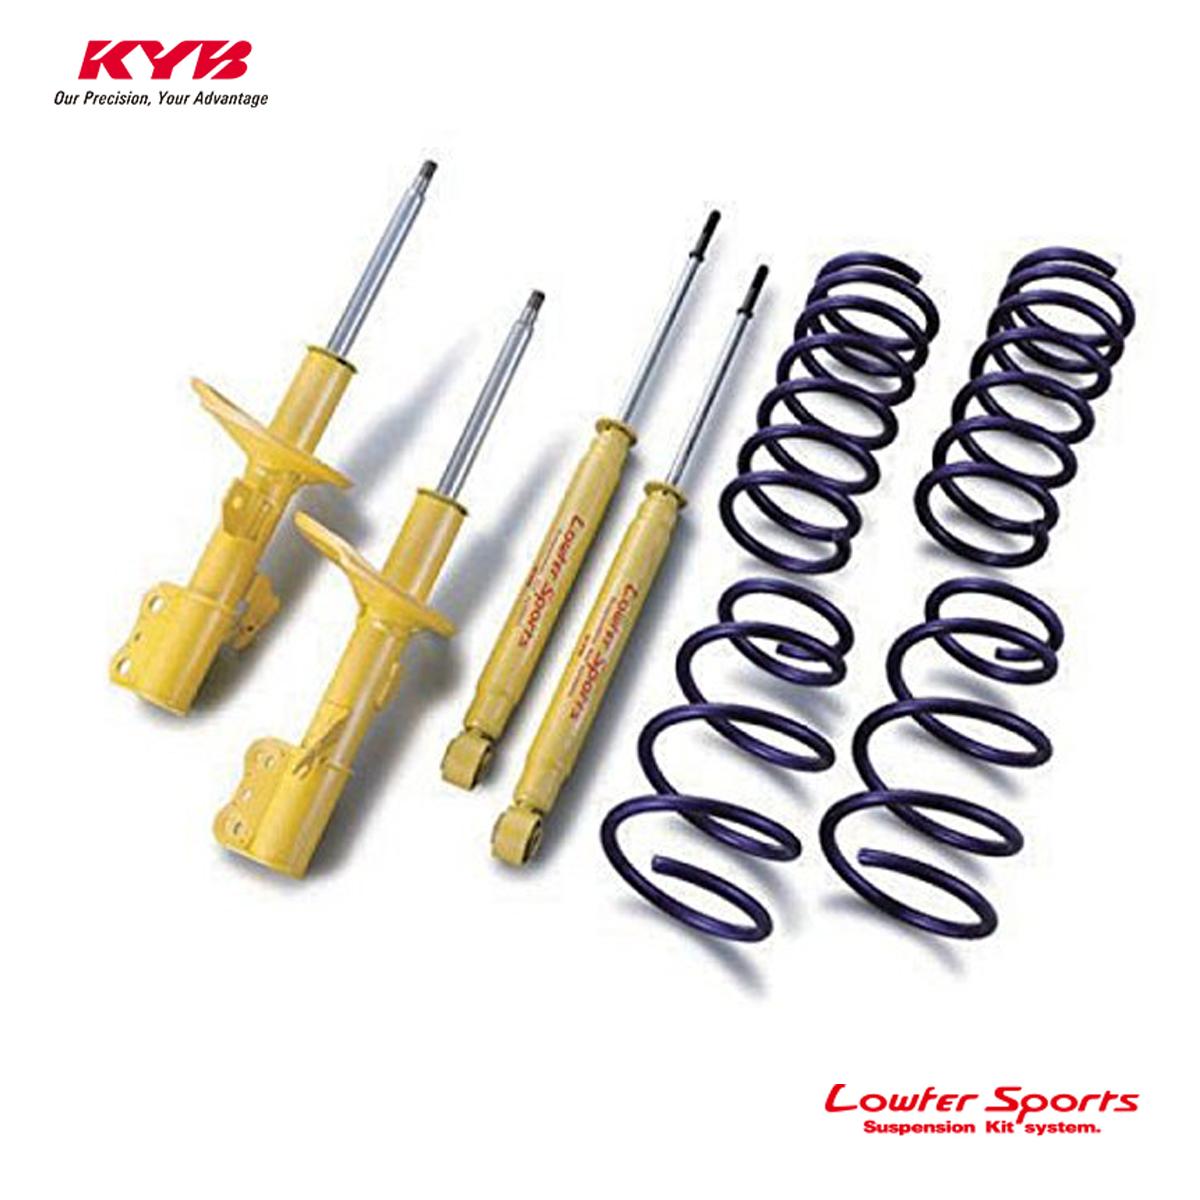 KYB カヤバ ランサーセディアワゴン CS5W ショックアブソーバー サスペンションキット Lowfer Sports LKIT-CS5W 配送先条件有り